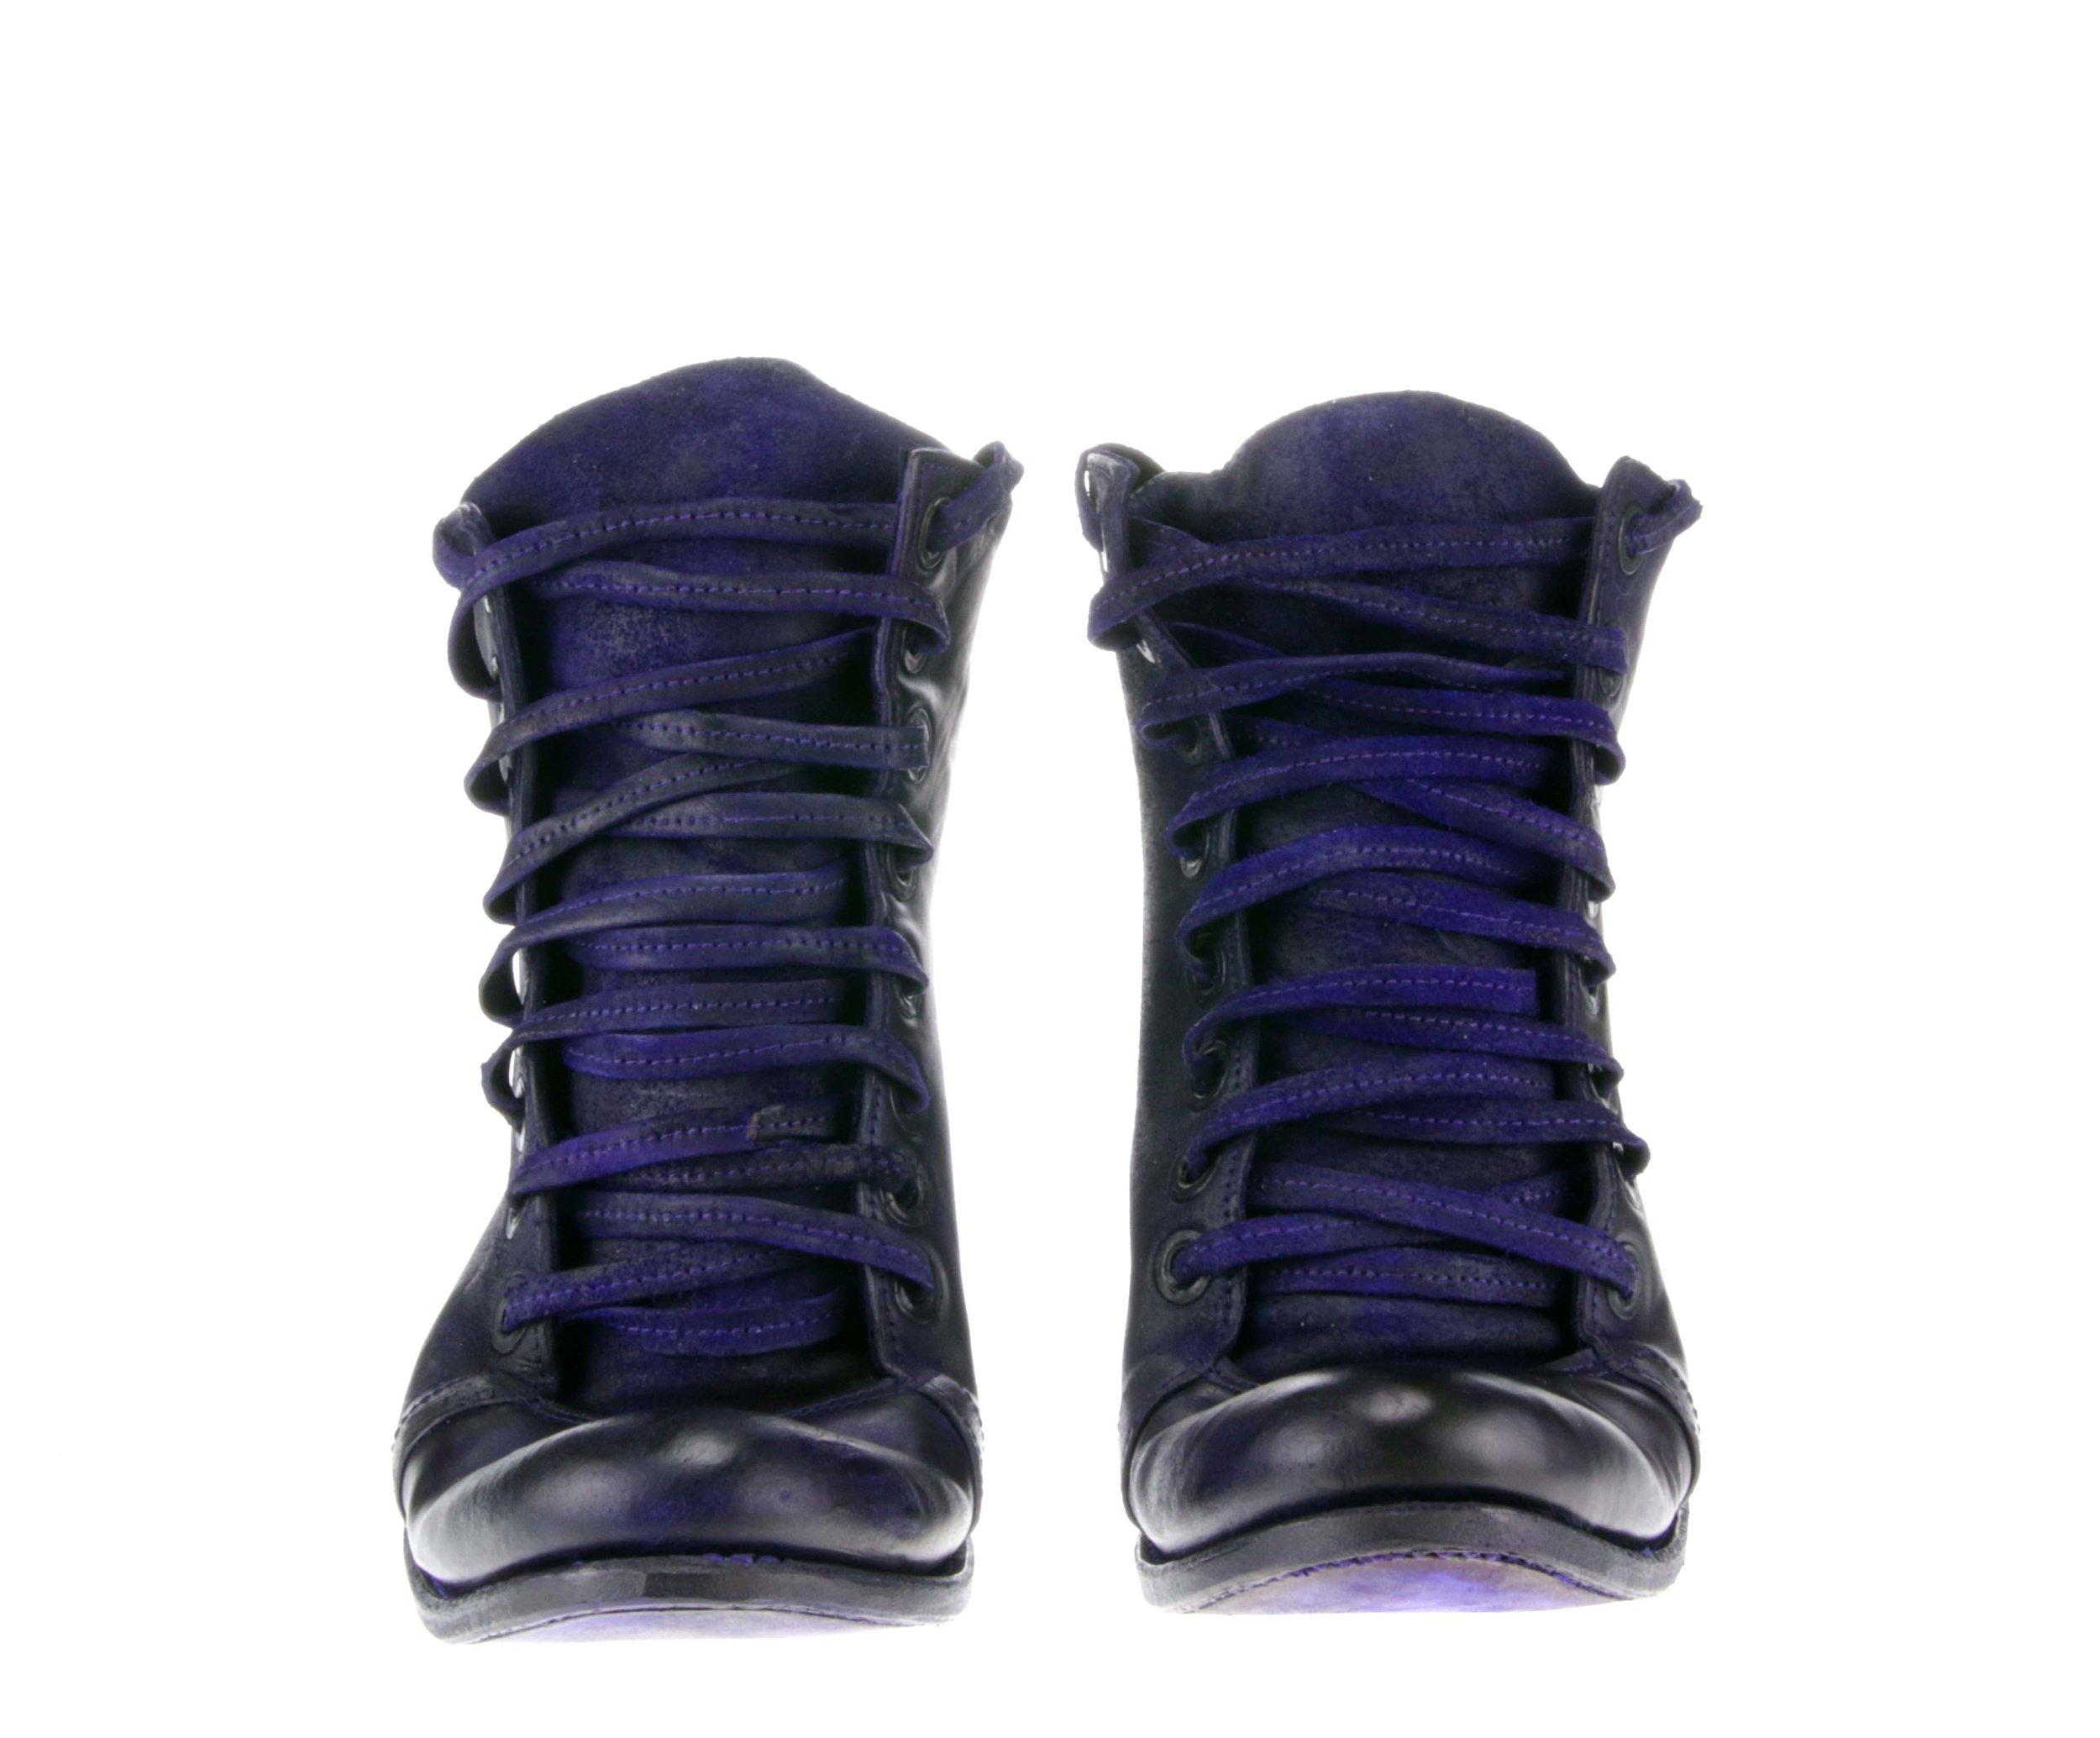 8Hole Work Boot Deep Purple Double Front.jpg